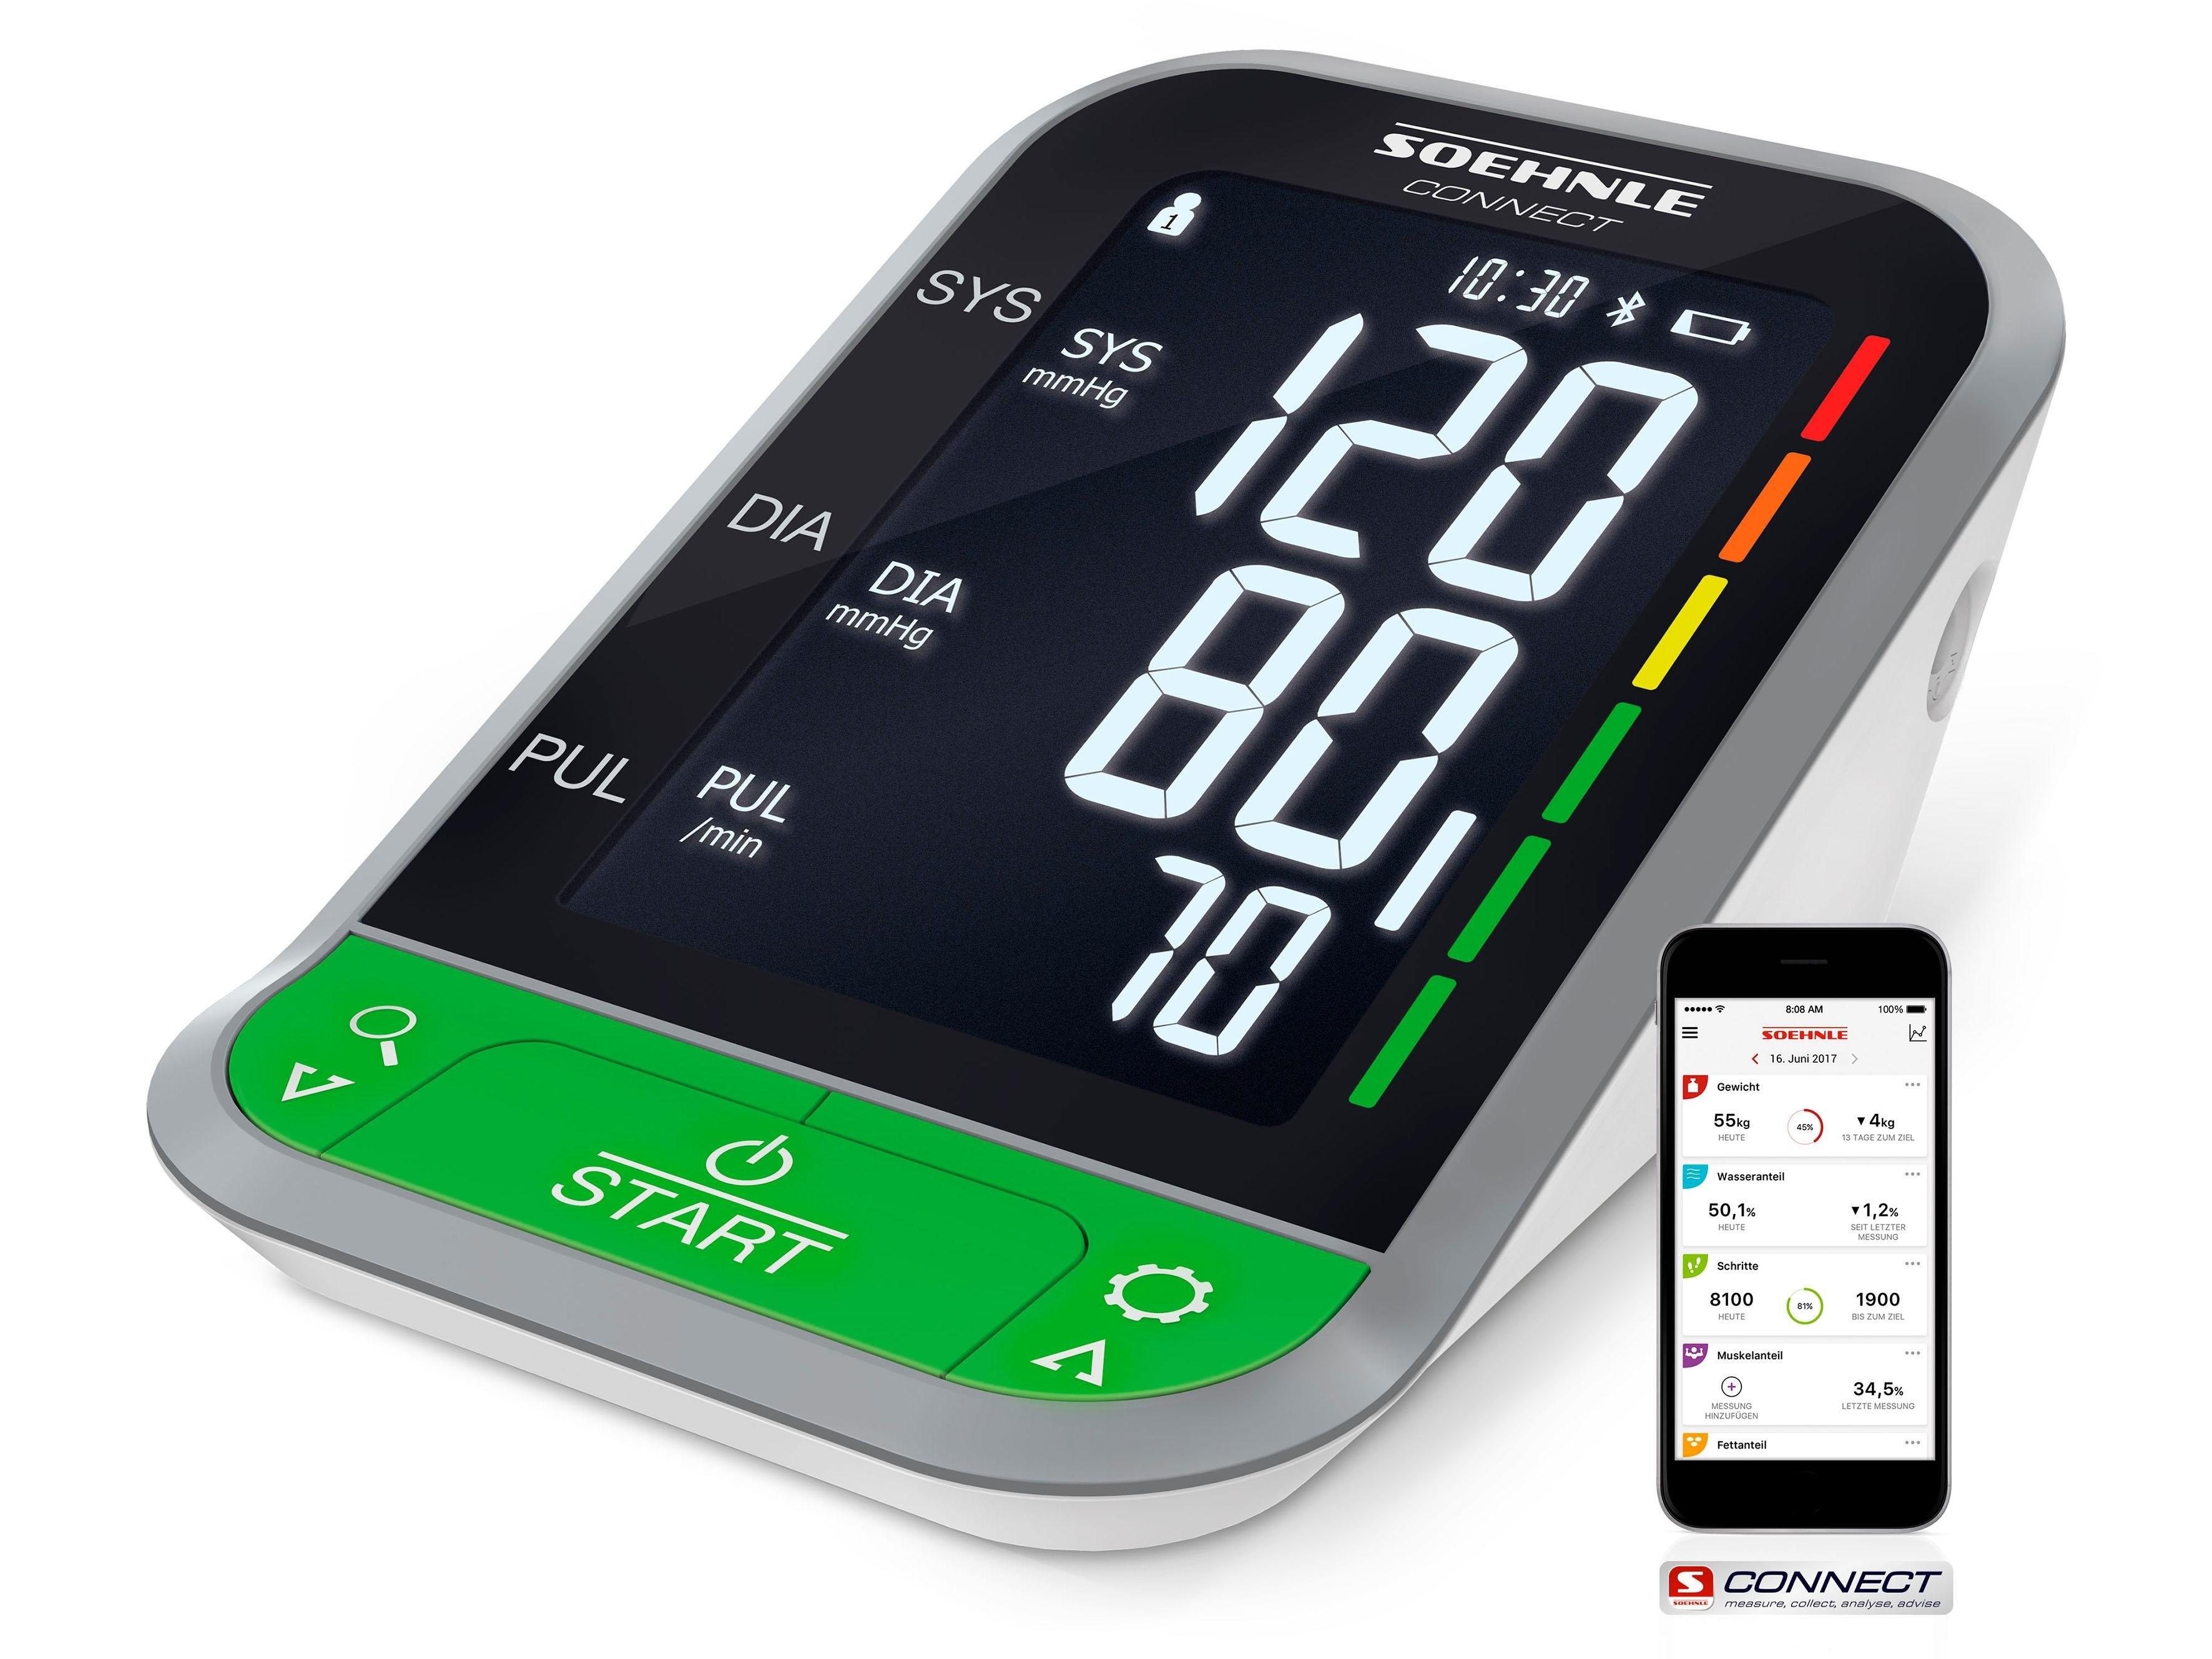 Soehnle bovenarm-bloeddrukmeter Systo Monitor Connect 400 - gratis ruilen op otto.nl